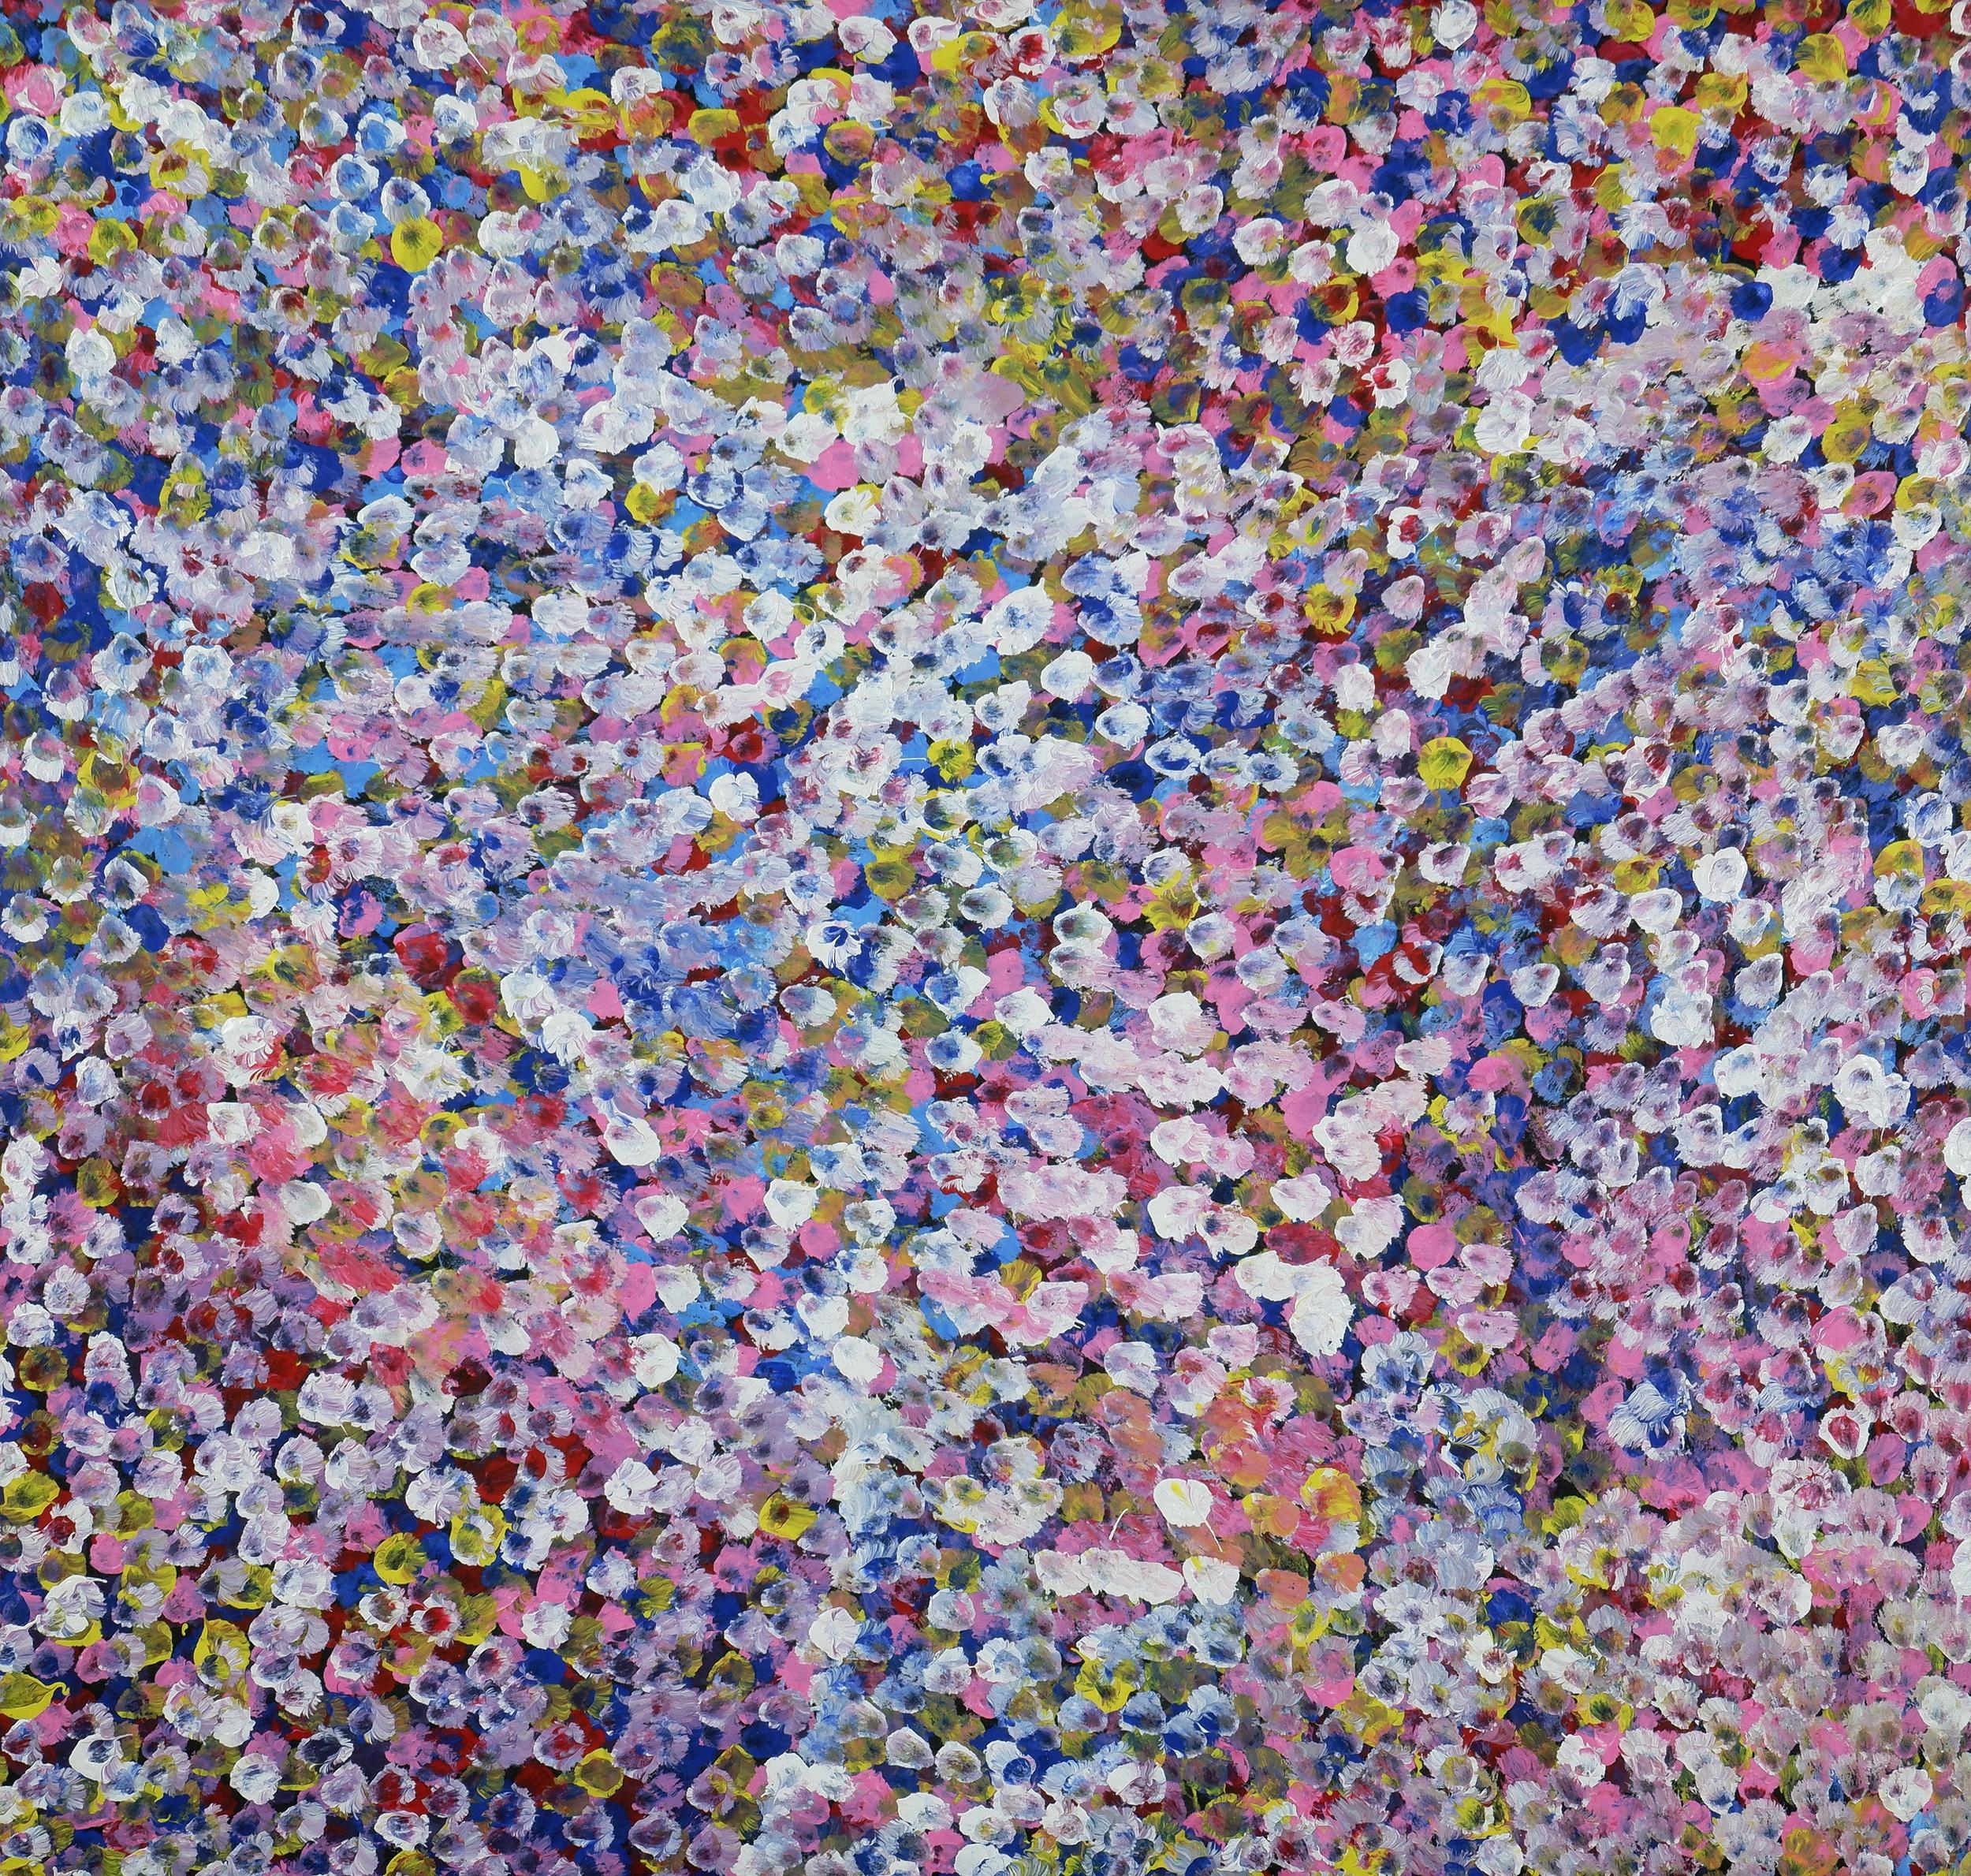 'Bessie Pitjara (born c1960, Anmatyerre language group), Bush Plums, Synthetic Polymer Paint on Canvas, 87 x 91 cm'